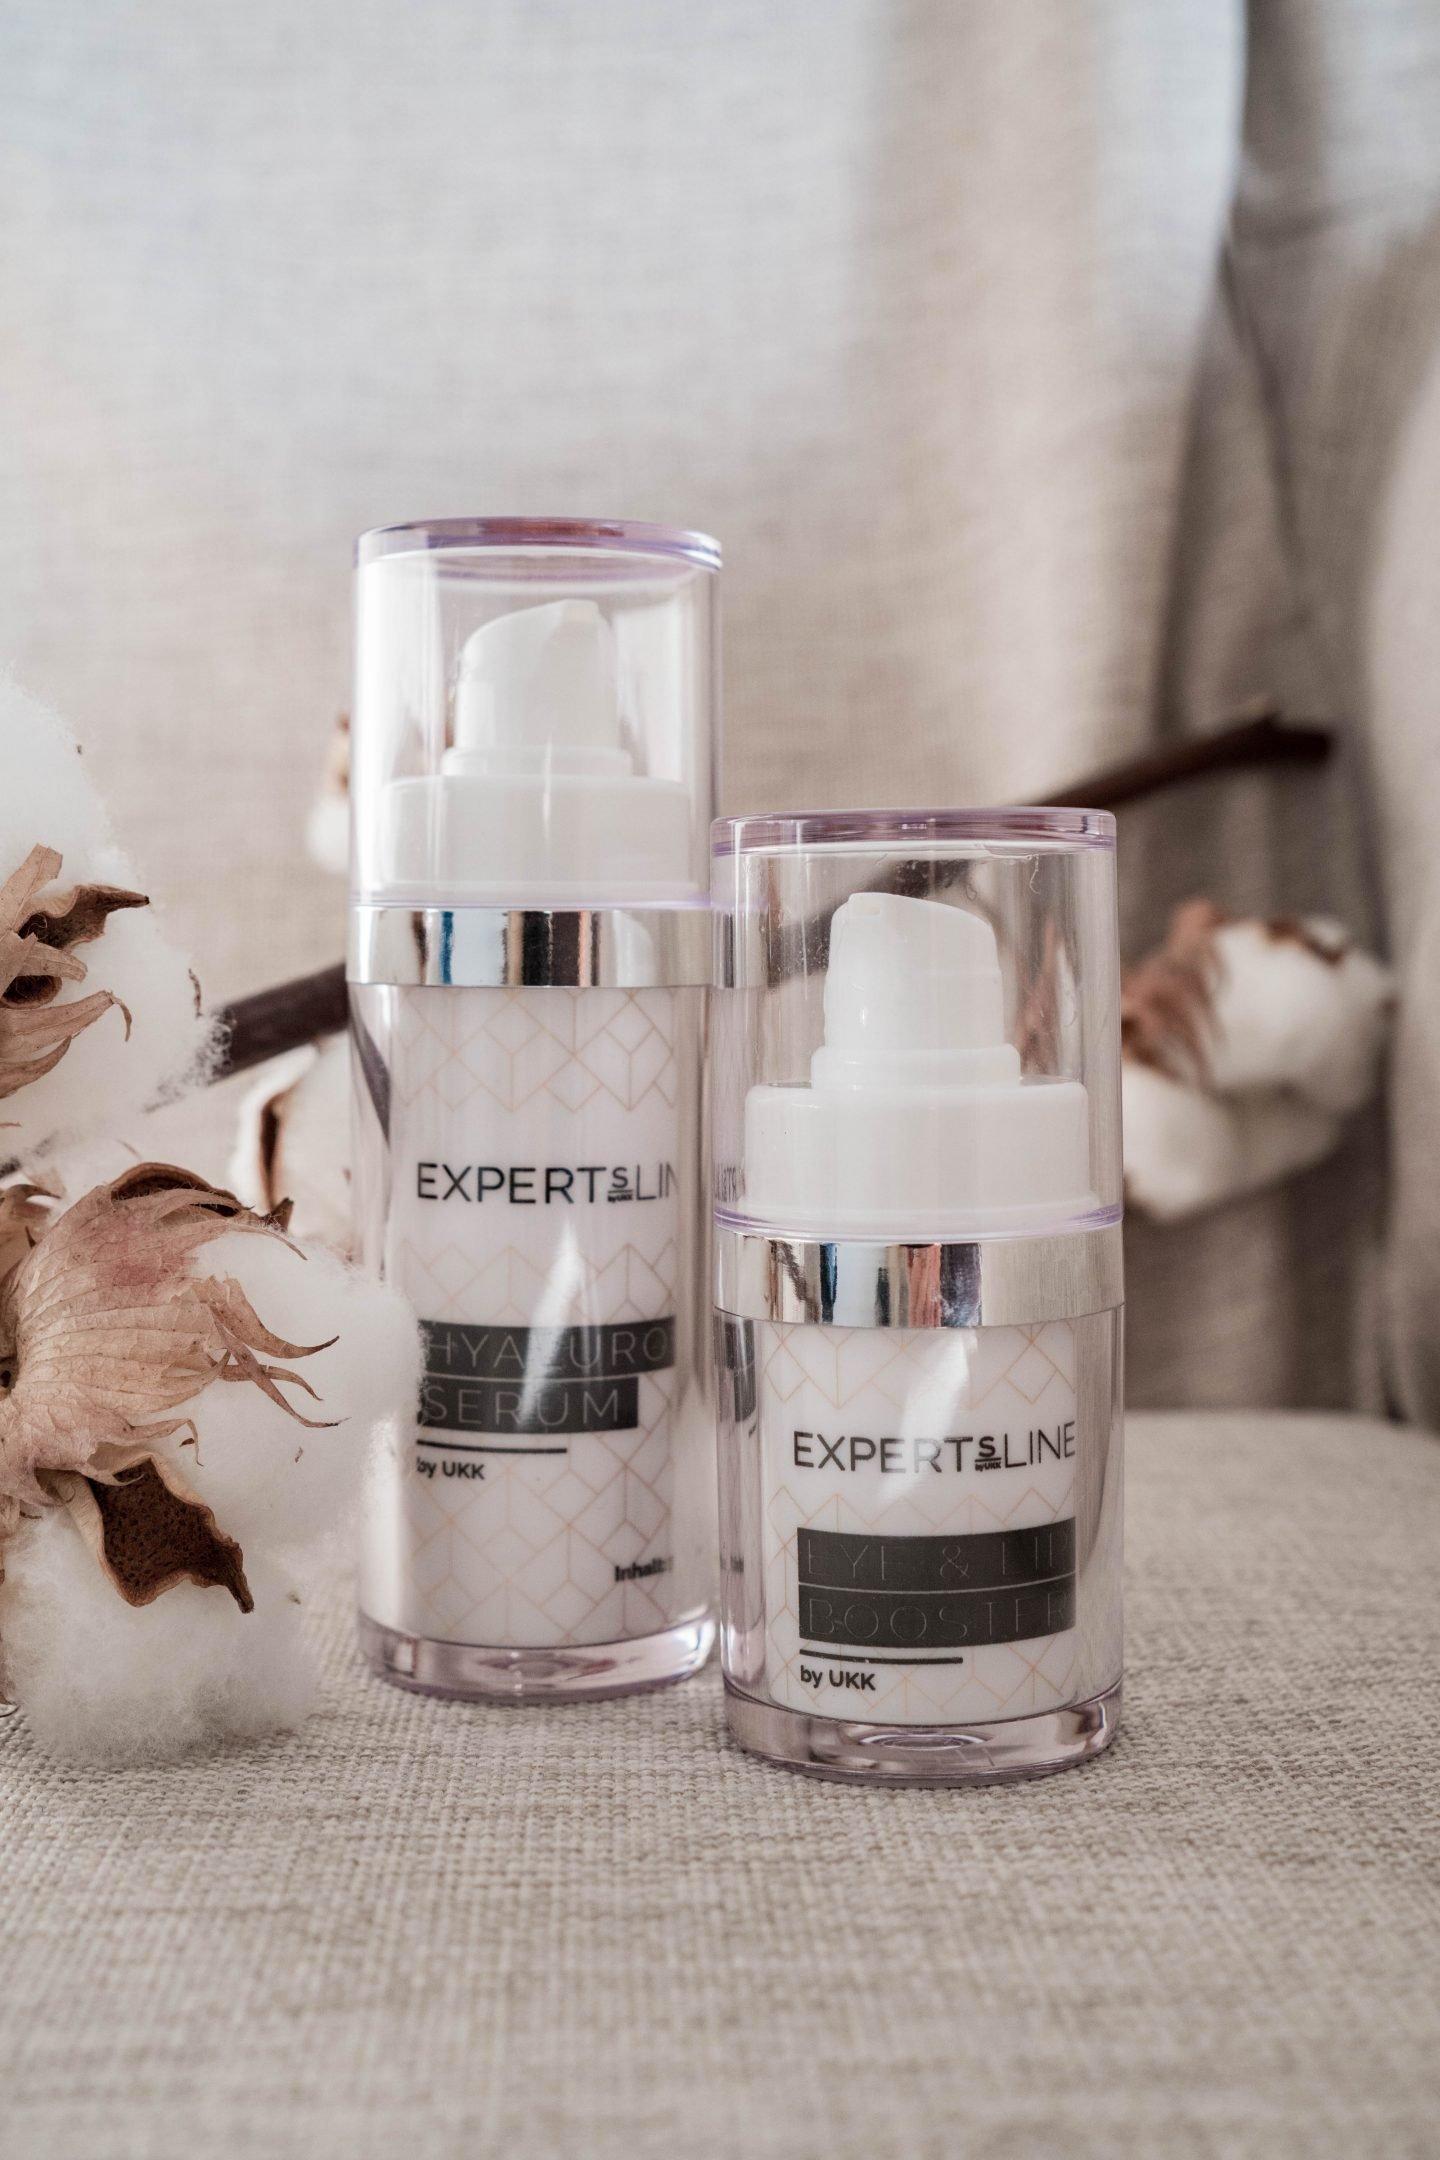 Beautyblog - ExpertsLine - Veralice - beste Anti-Aging Produkte - beste Inhaltsstoffe - Hyaluronserum - Eye and Lip Booster - Argireline - Beta Glucan - Nowshine